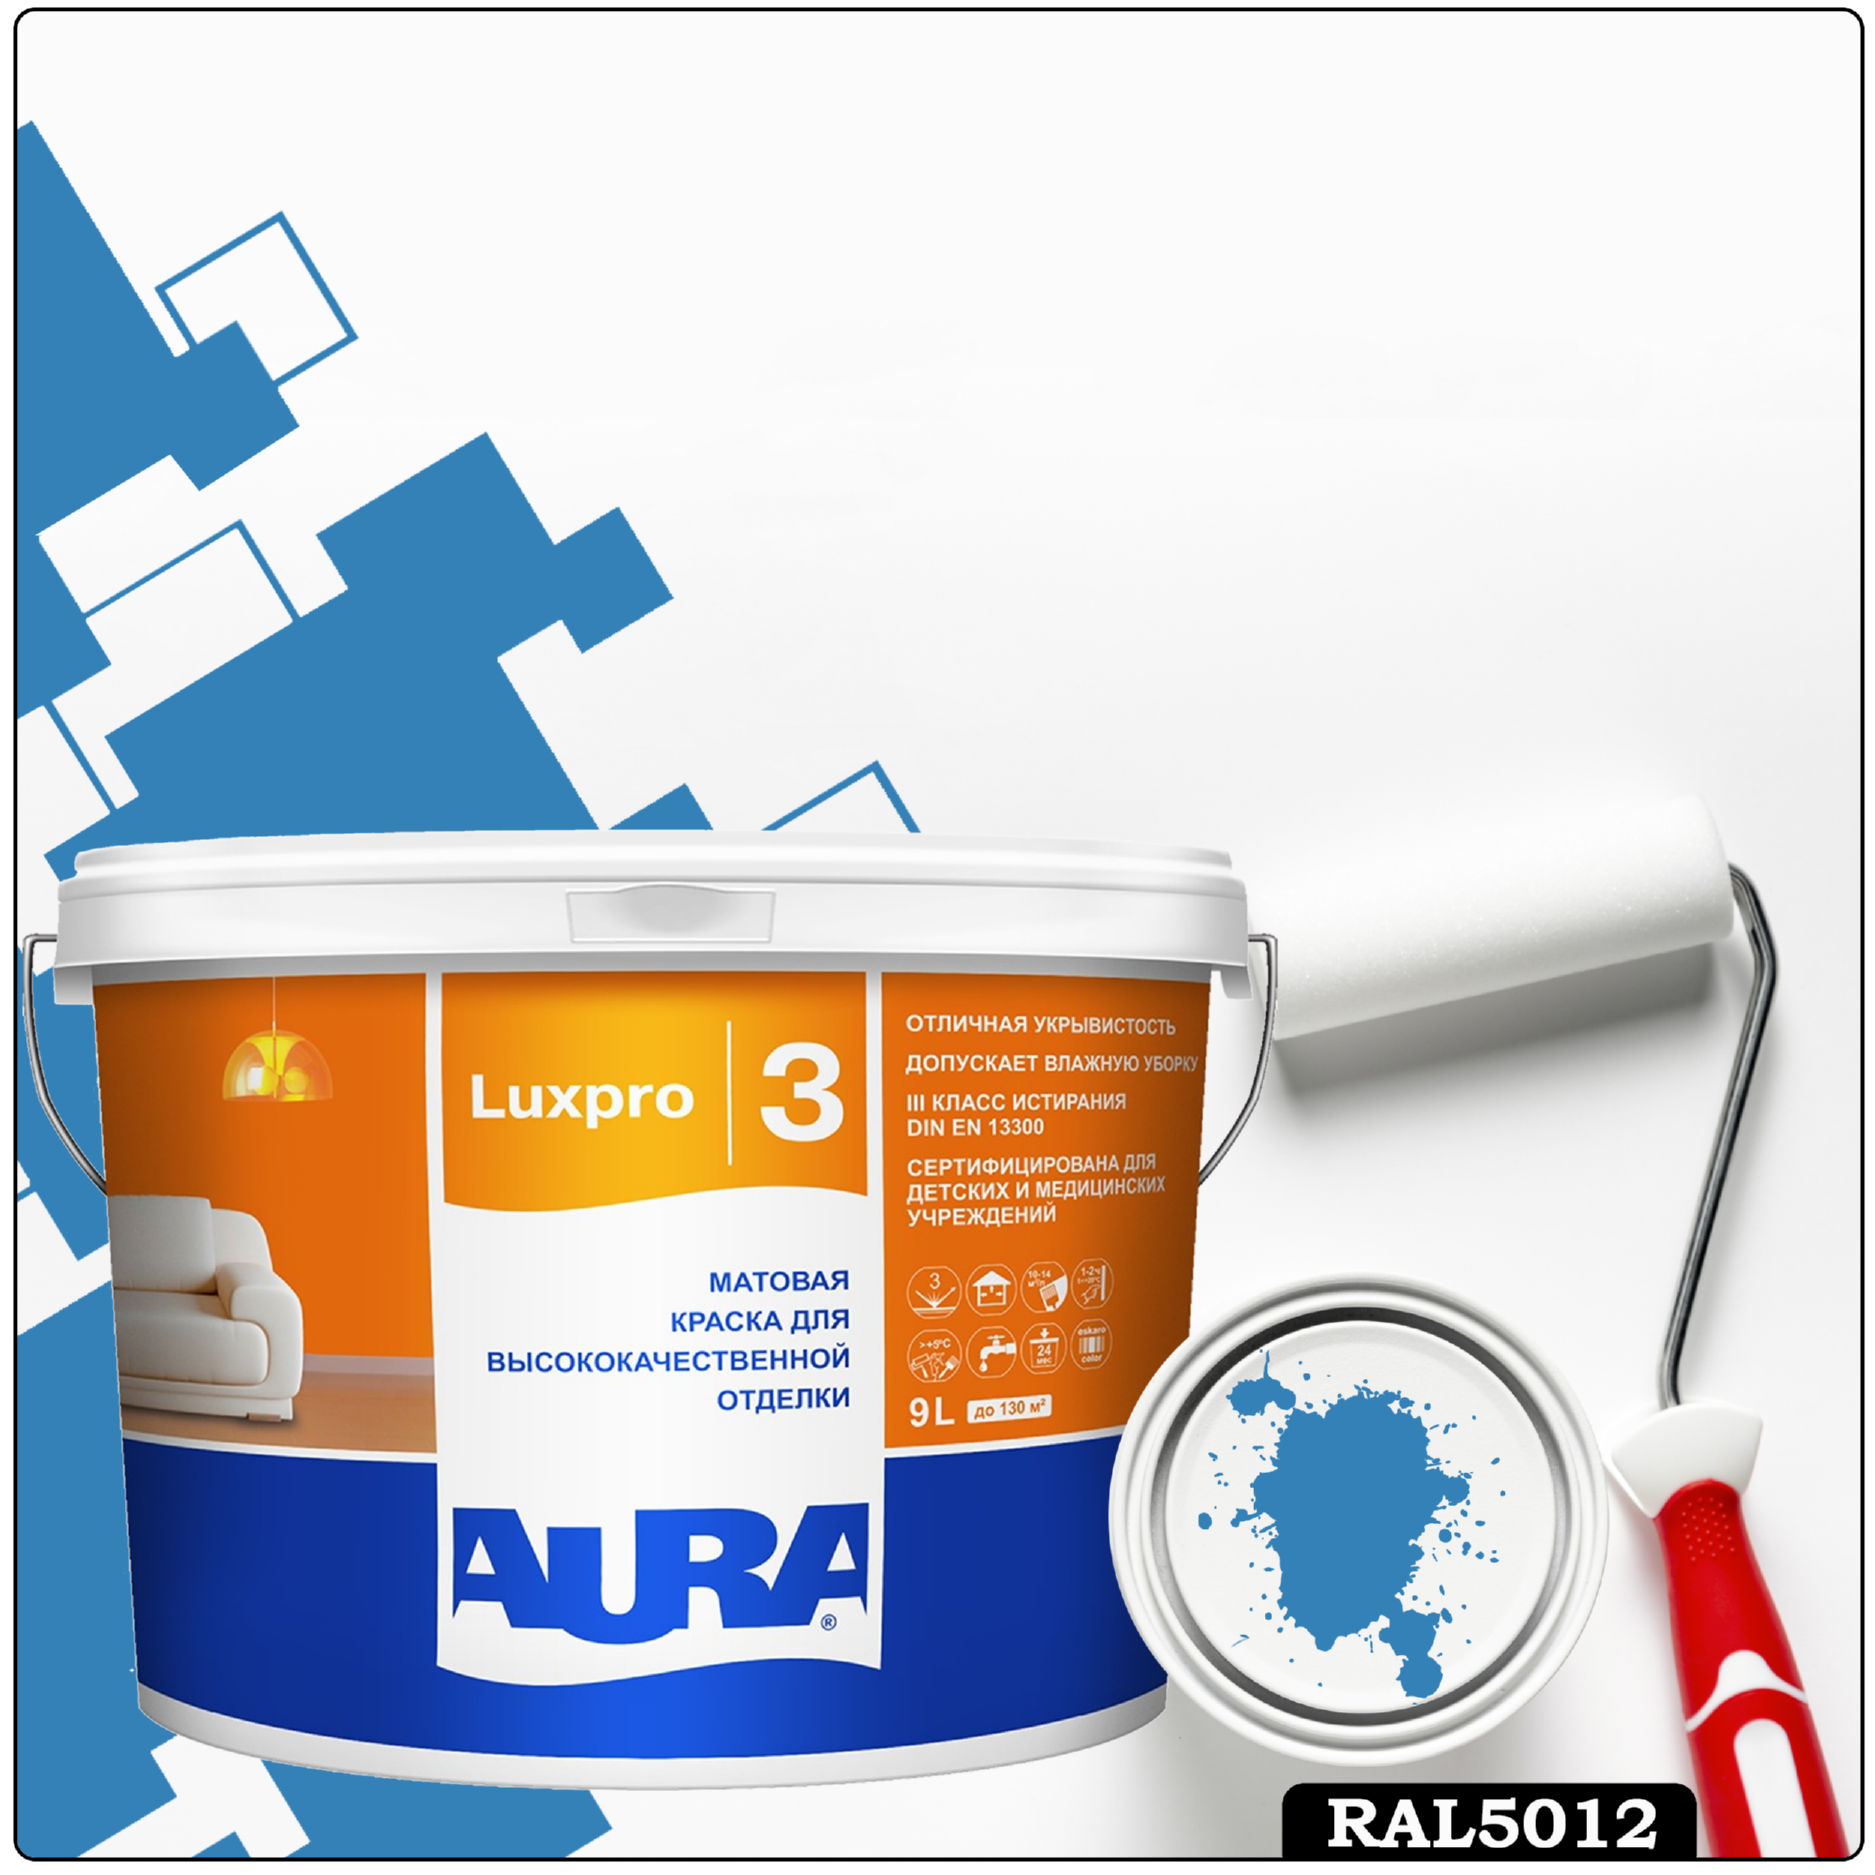 Фото 2 - Краска Aura LuxPRO 3, RAL 5012 Голубой, латексная, шелково-матовая, интерьерная, 9л, Аура.